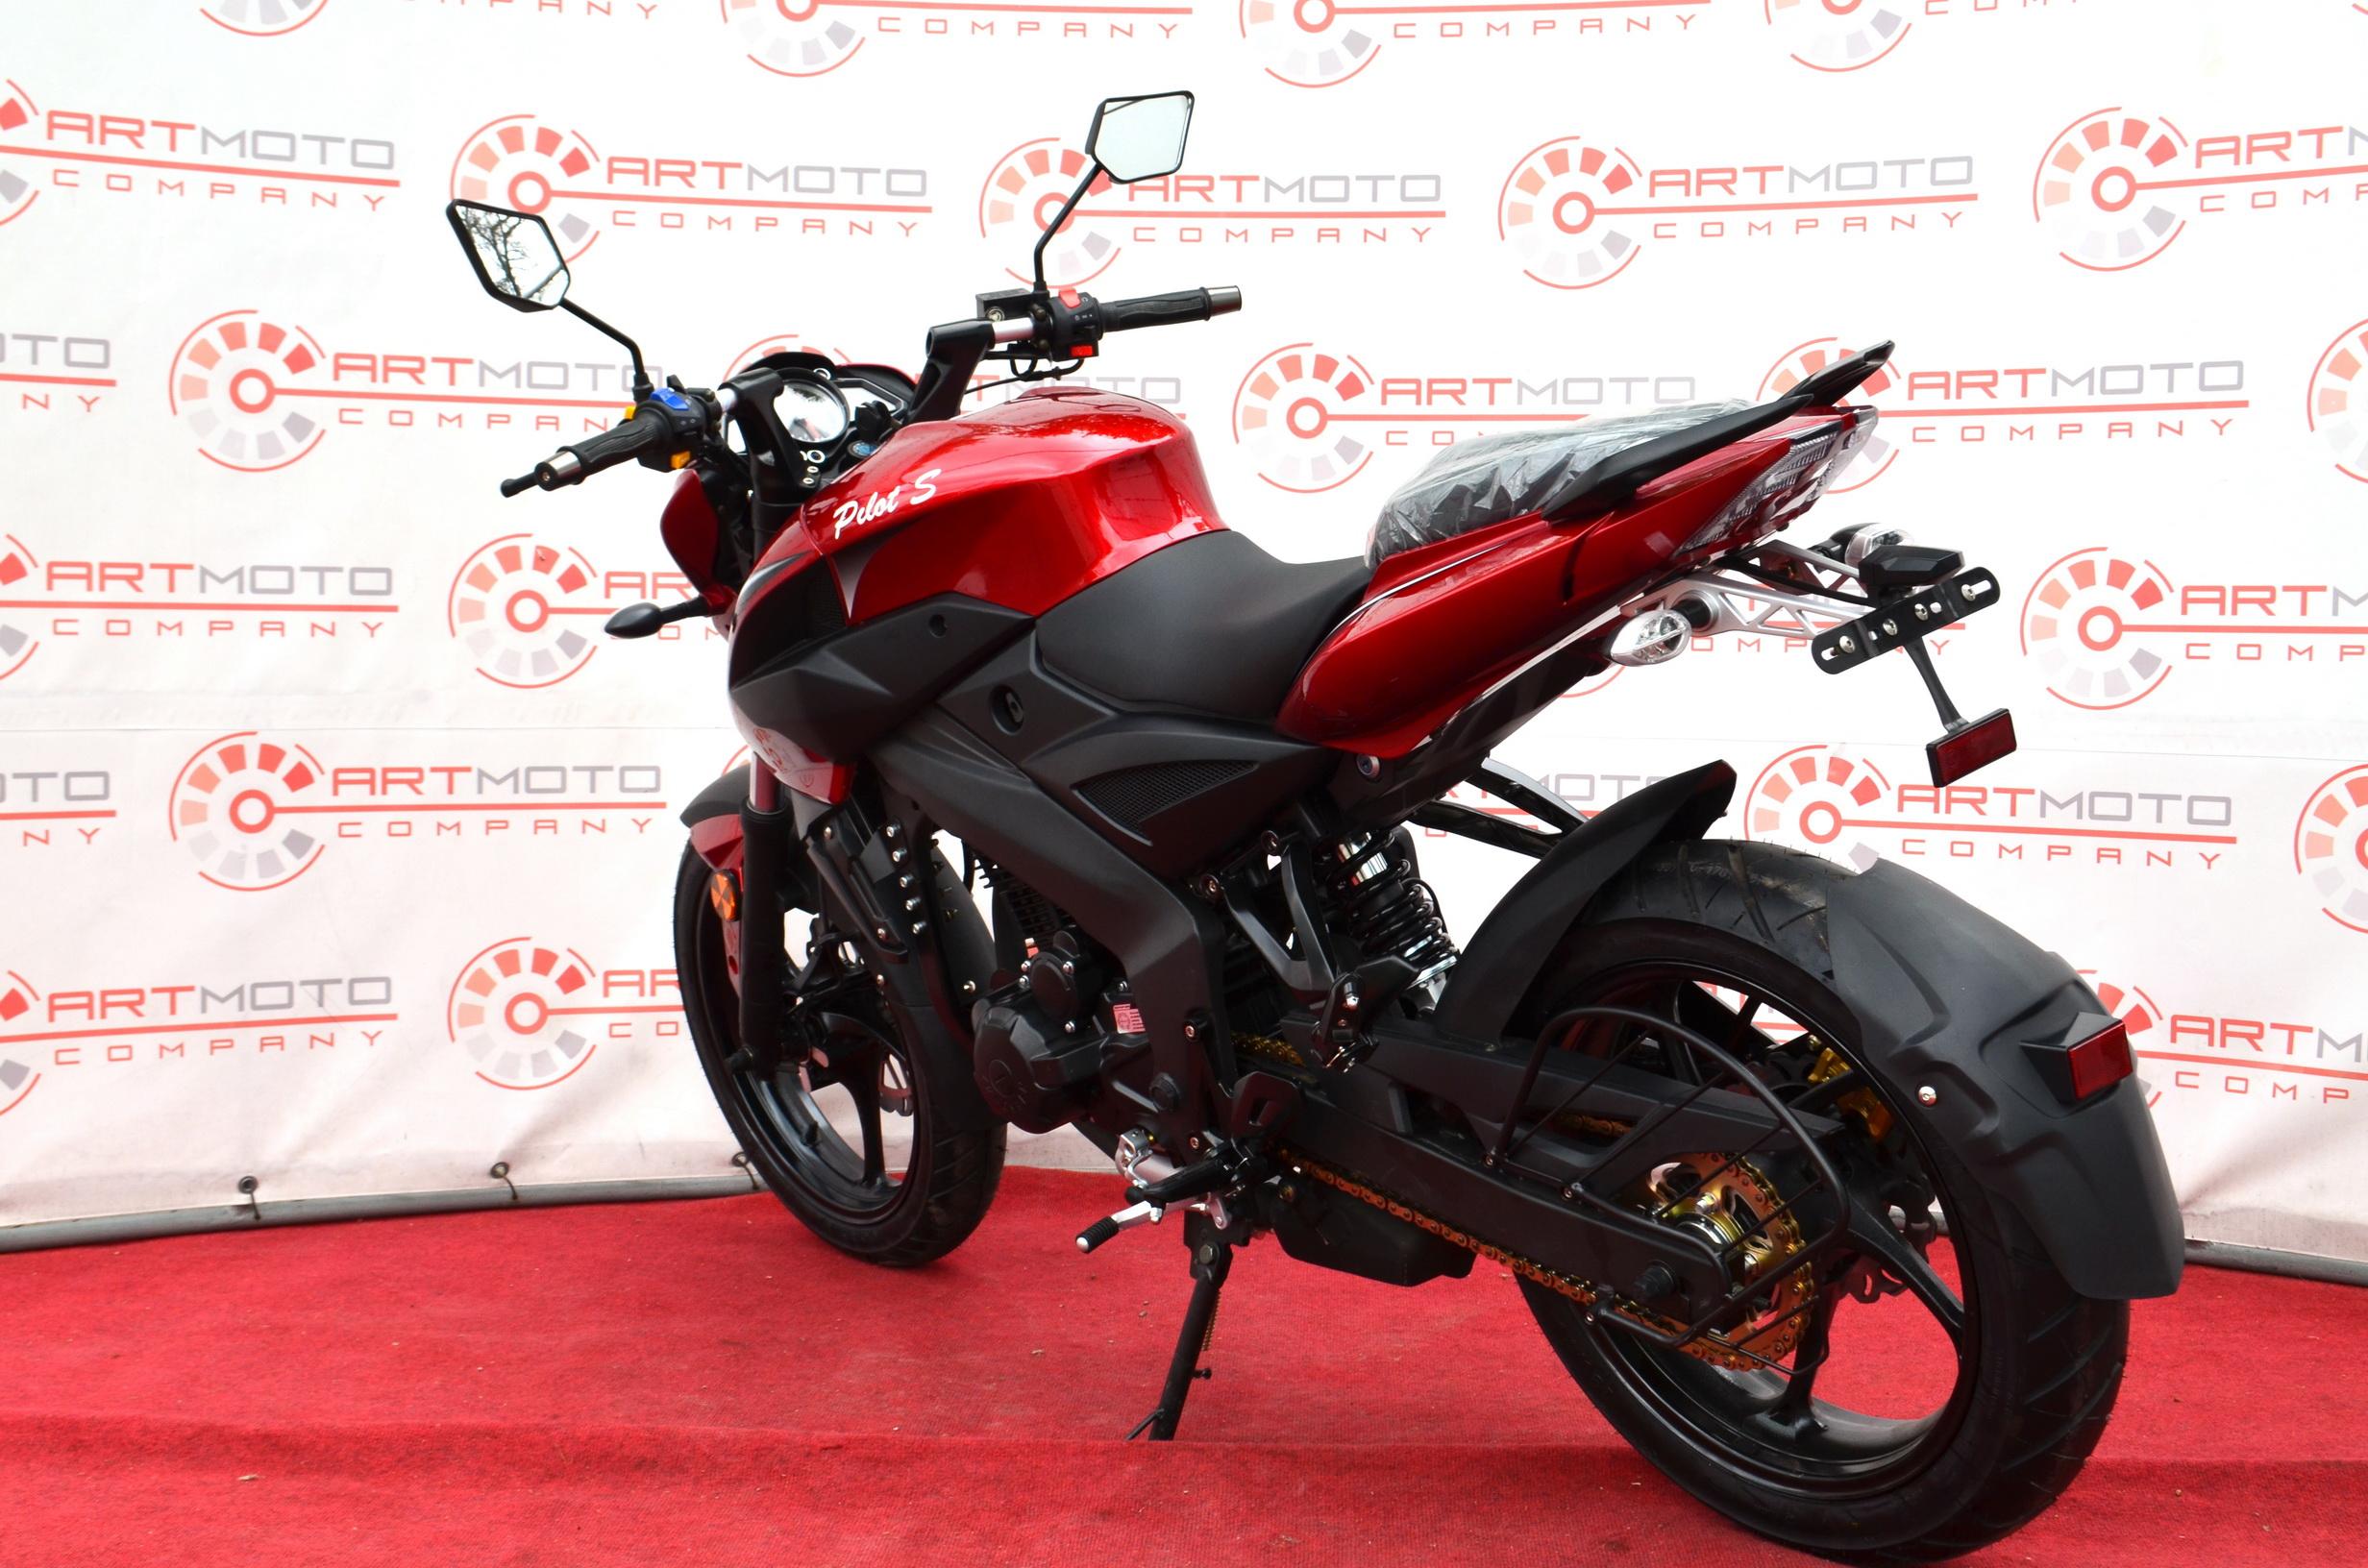 МОТОЦИКЛ BASHAN PILOT S 250 Red ― Артмото - купить квадроцикл в украине и харькове, мотоцикл, снегоход, скутер, мопед, электромобиль